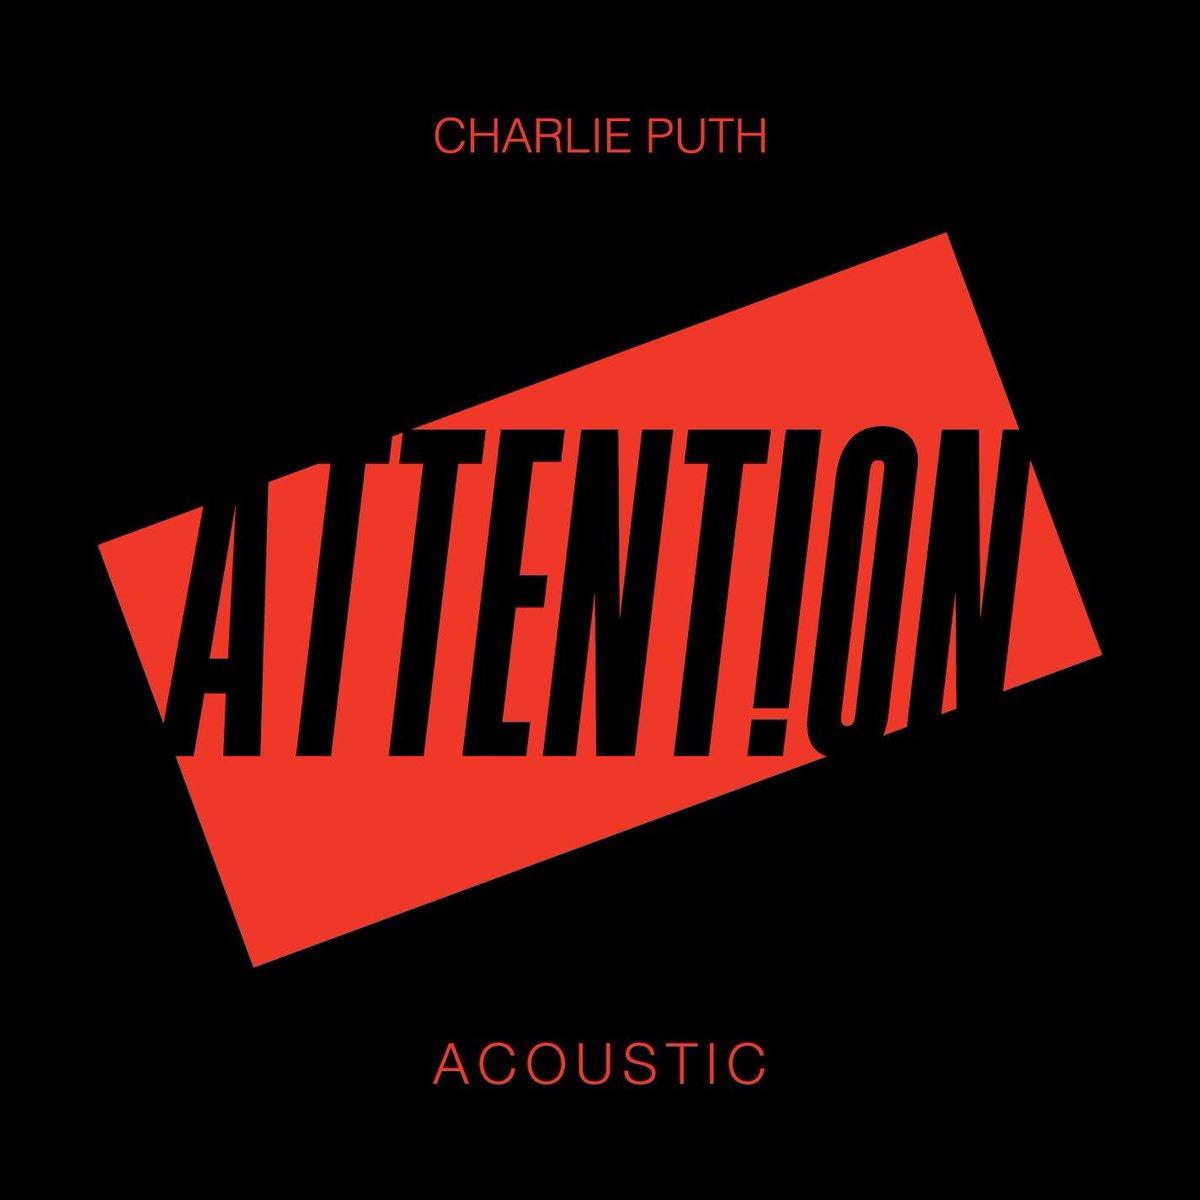 I don't like homework Maybe I need some rhythmic songs#Charlie Puth @charlieputh @billboardpic.twitter.com/AeQA9DVoOX